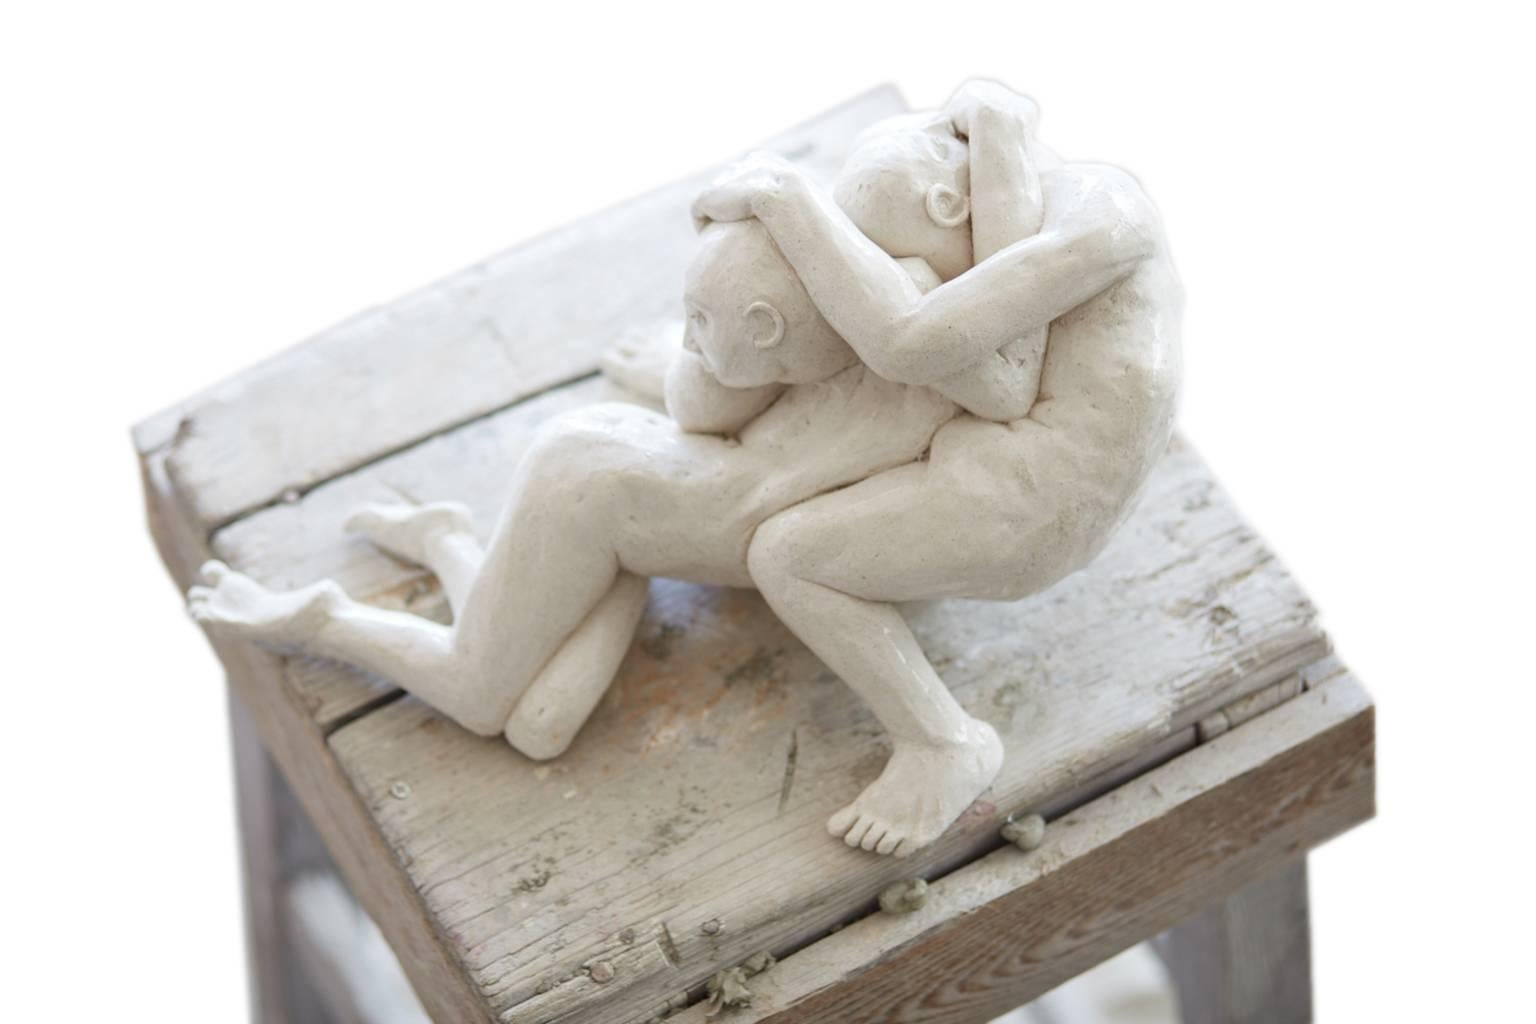 Pieta II - contemporary interpretation of iconic embrace tabletop sculpture